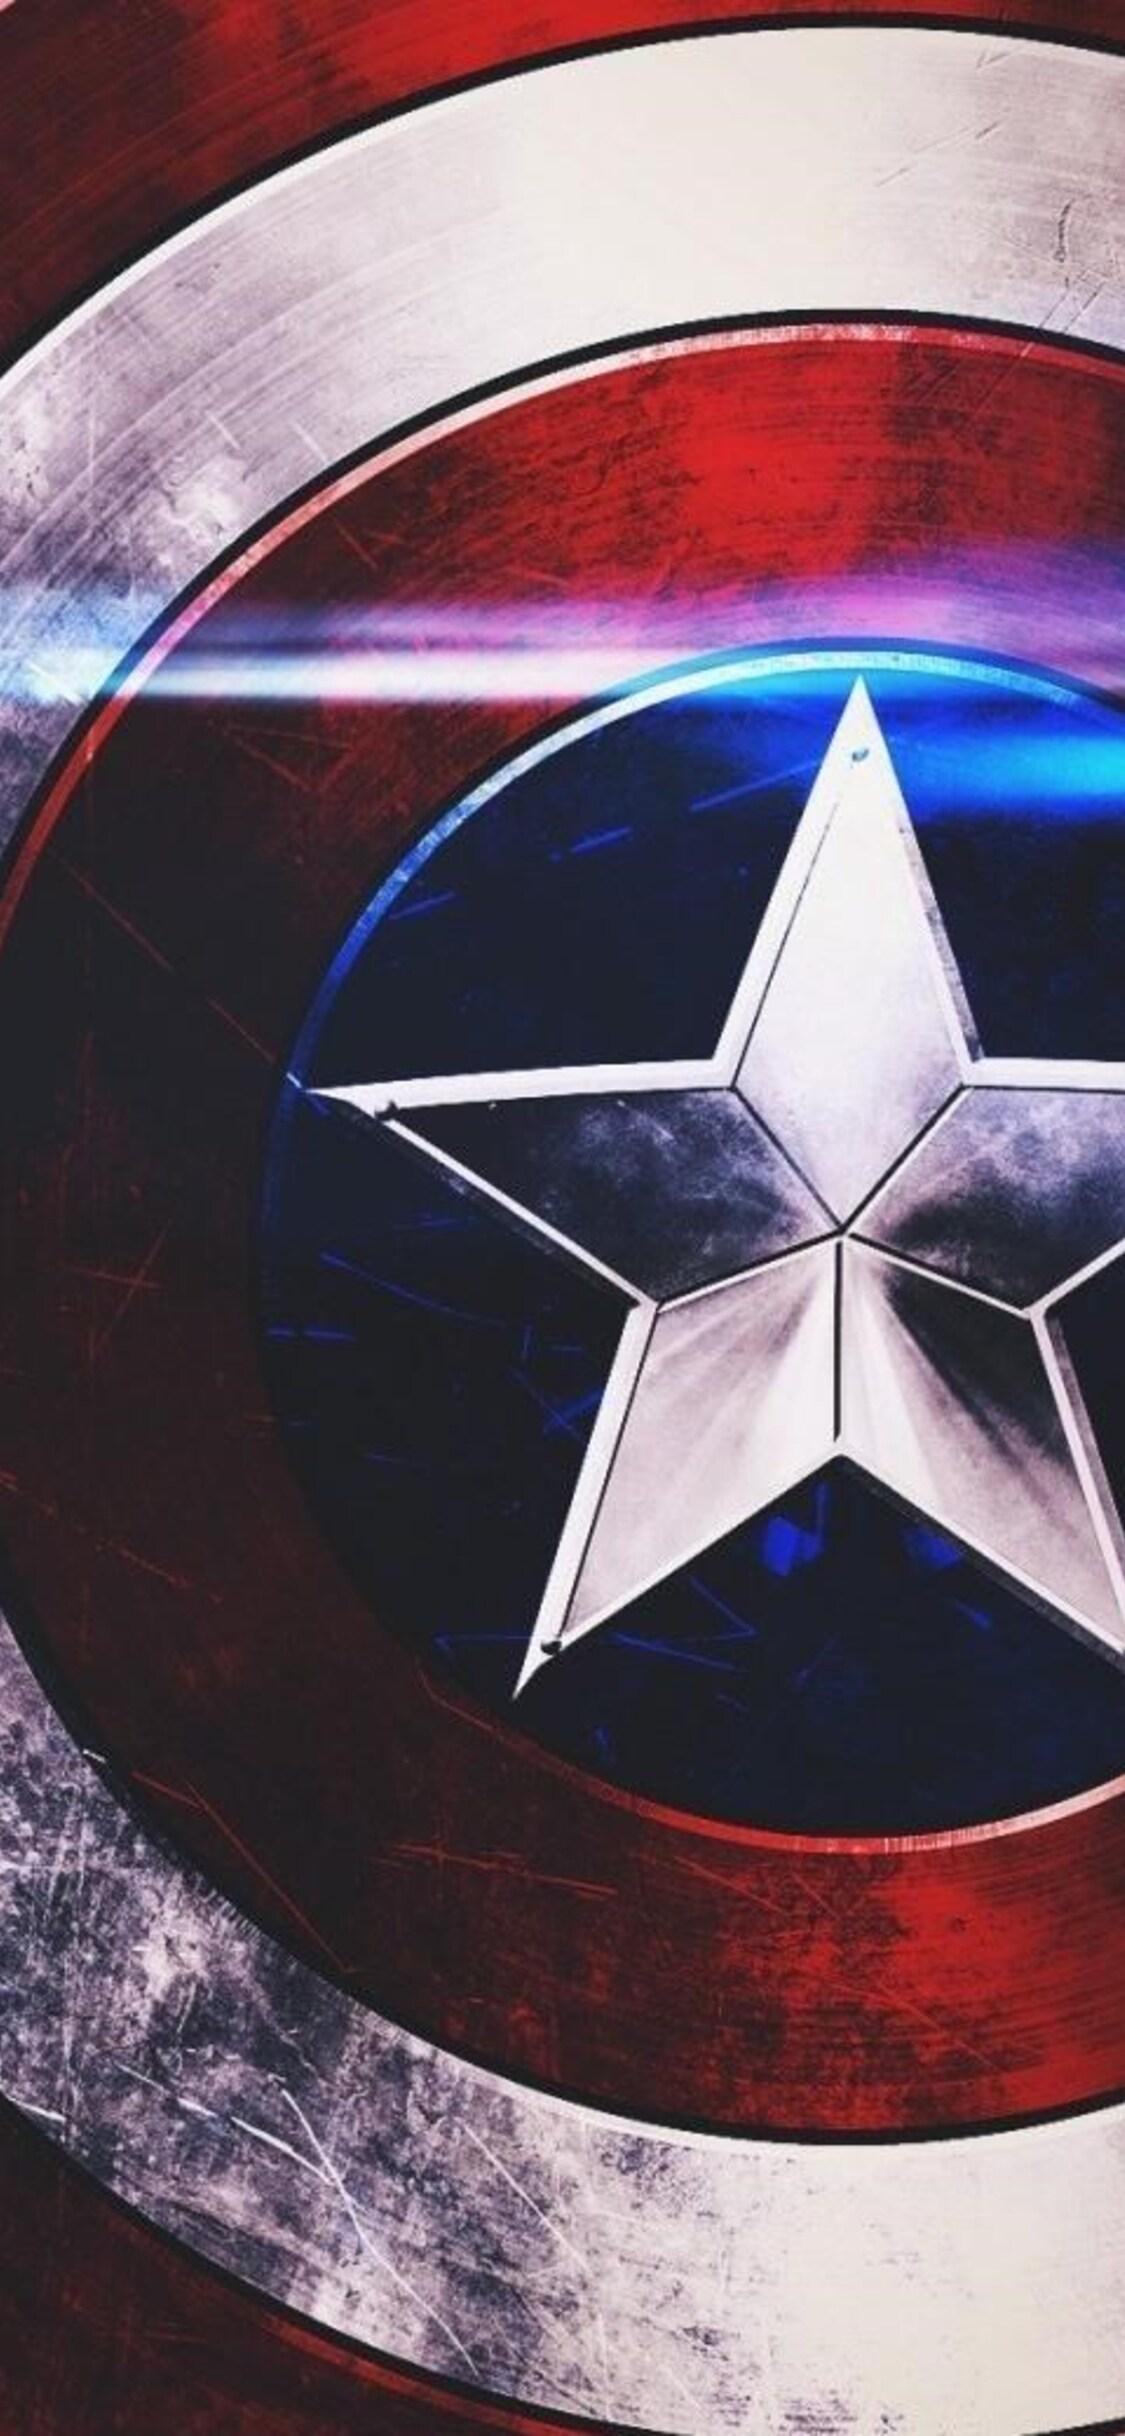 captain-america-shield-image.jpg